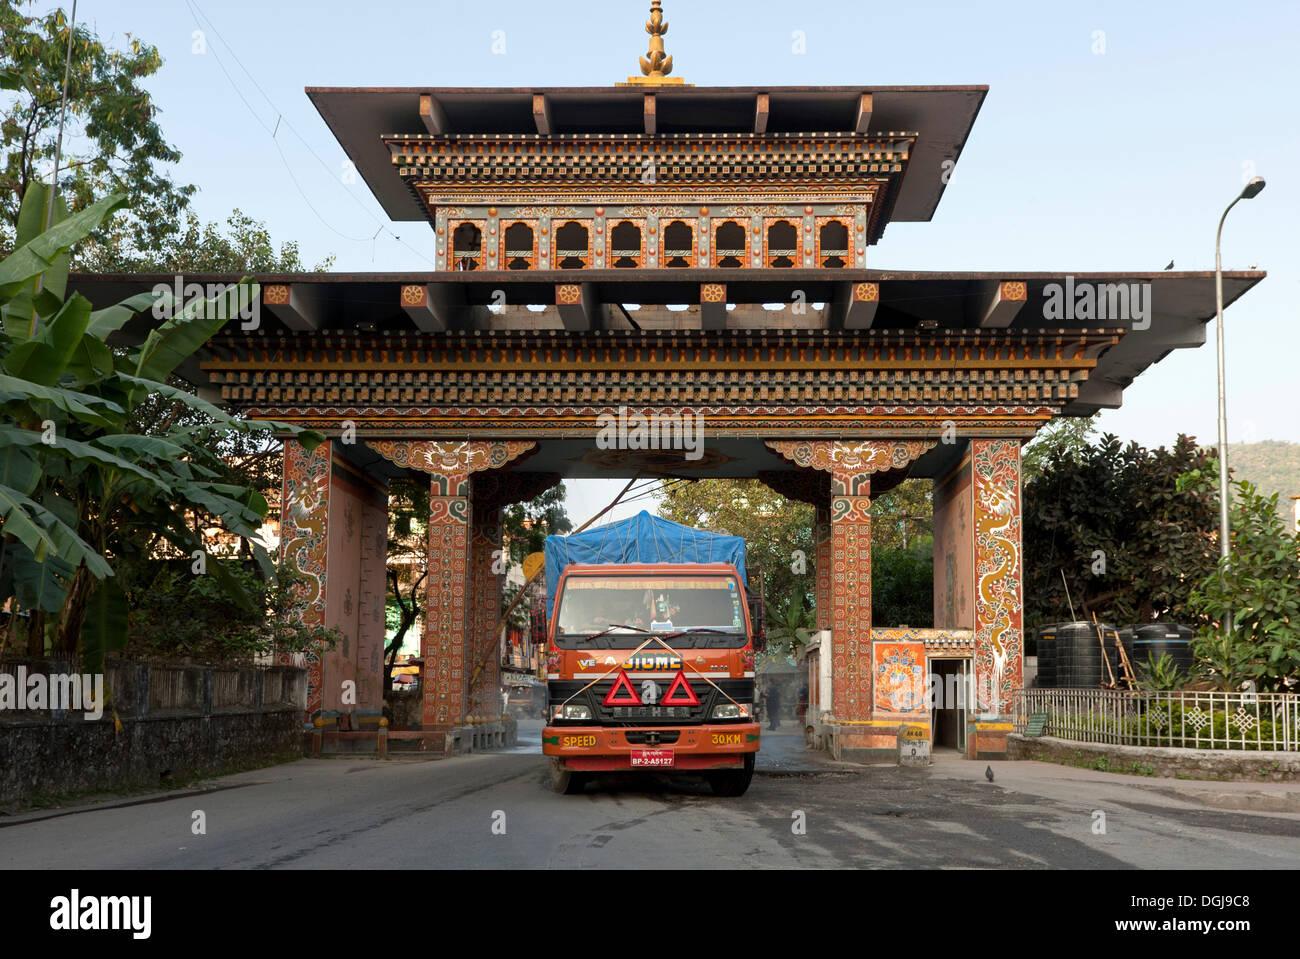 Truck of a Bhutanese transport company crossing the border through the Bhutan Gate, Gate of Bhutan, from Jaigoan, West Bengal - Stock Image